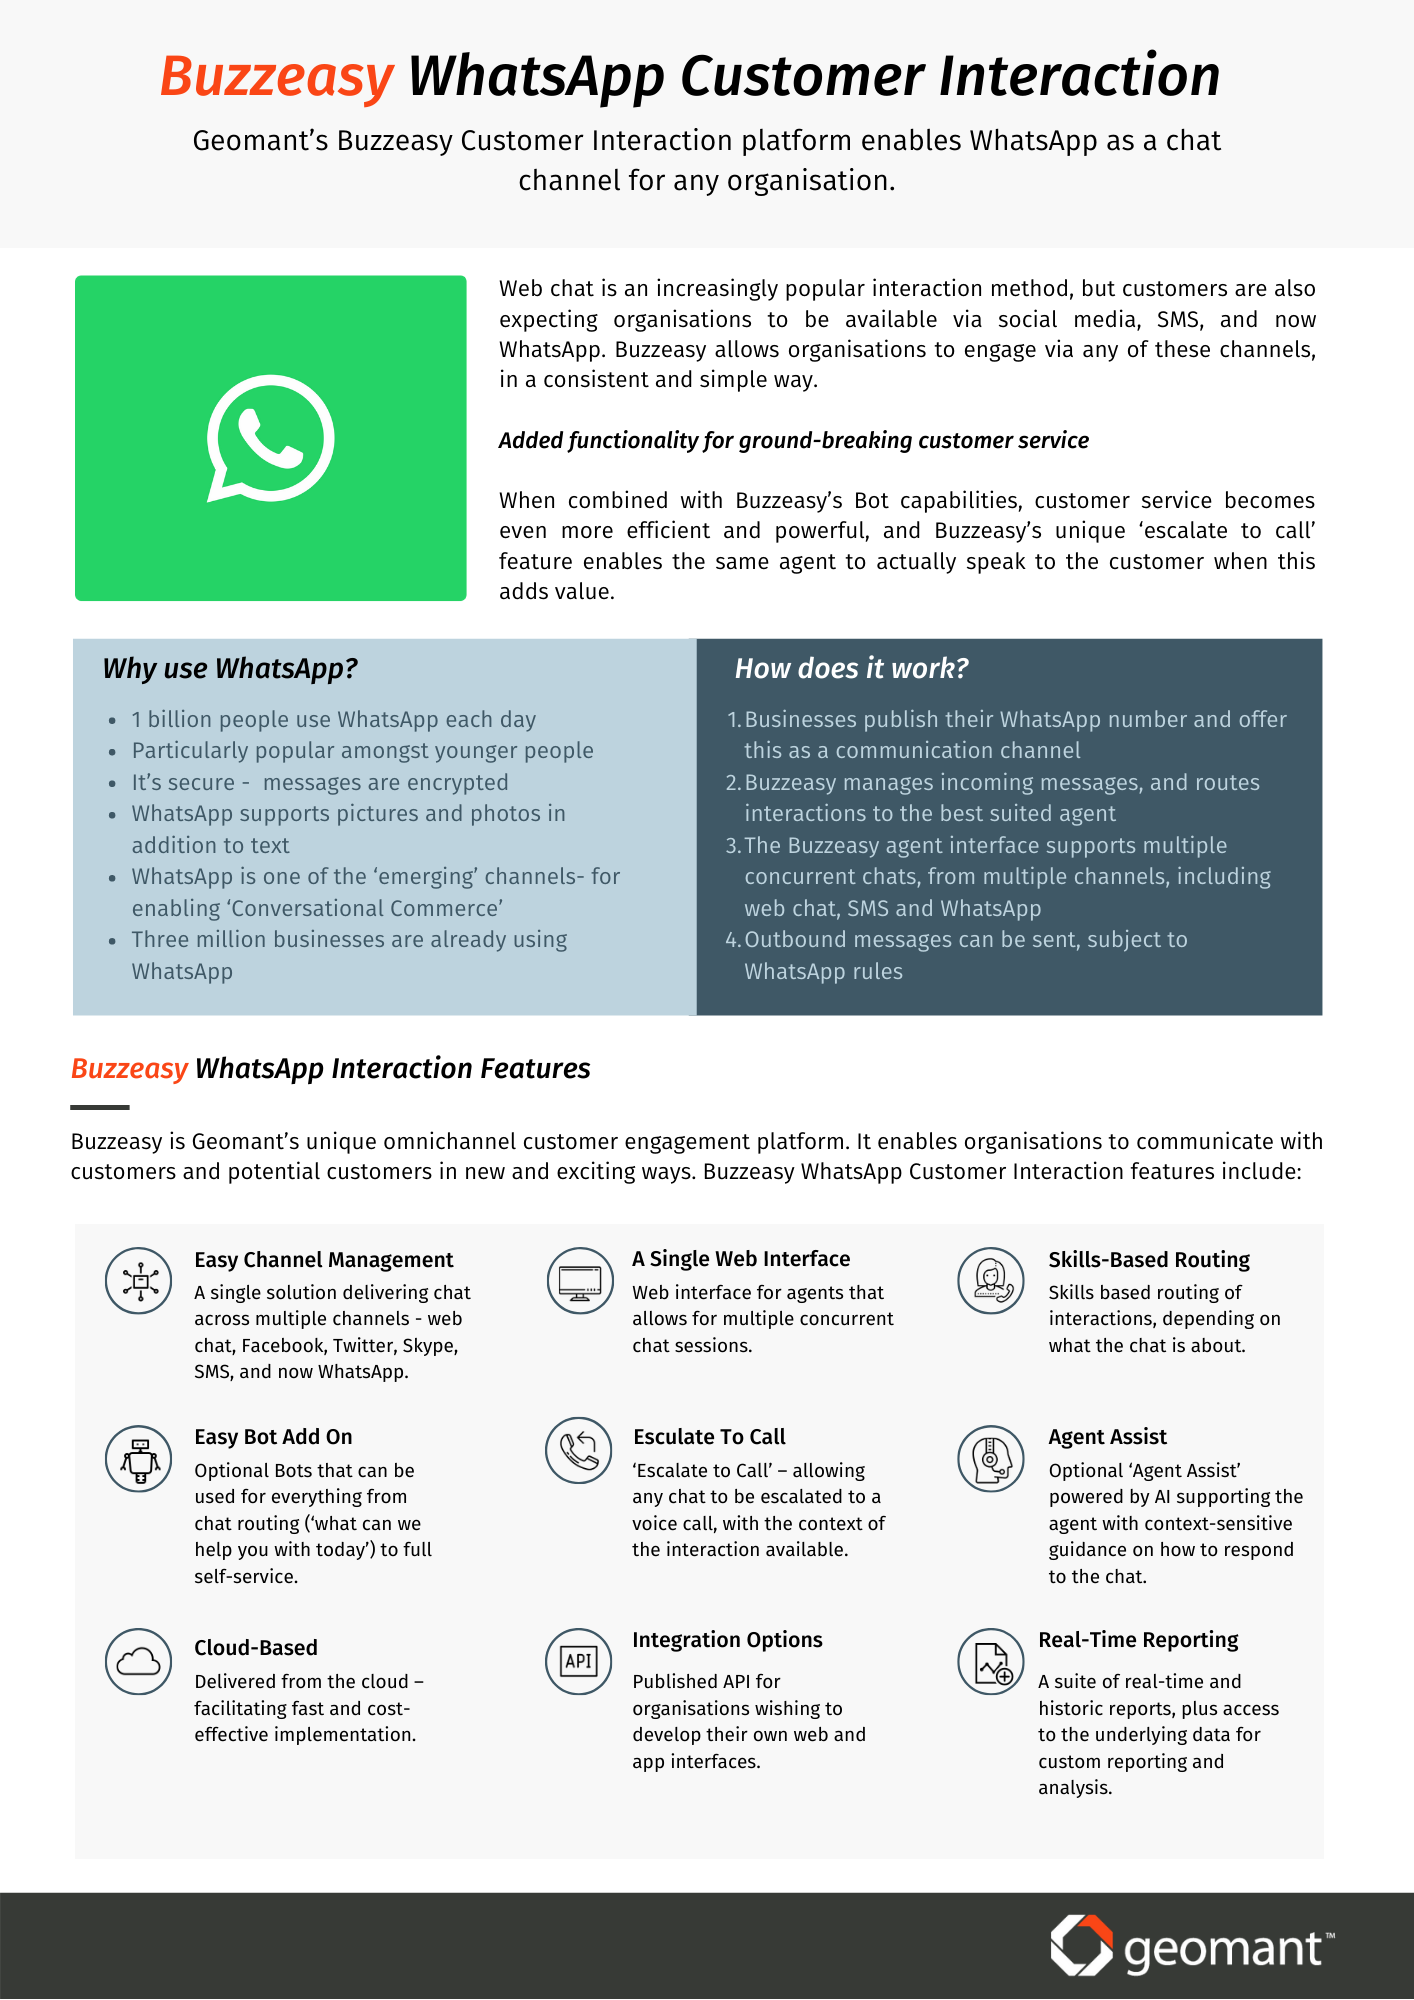 Buzzeasy WhatsApp Screenshot 1